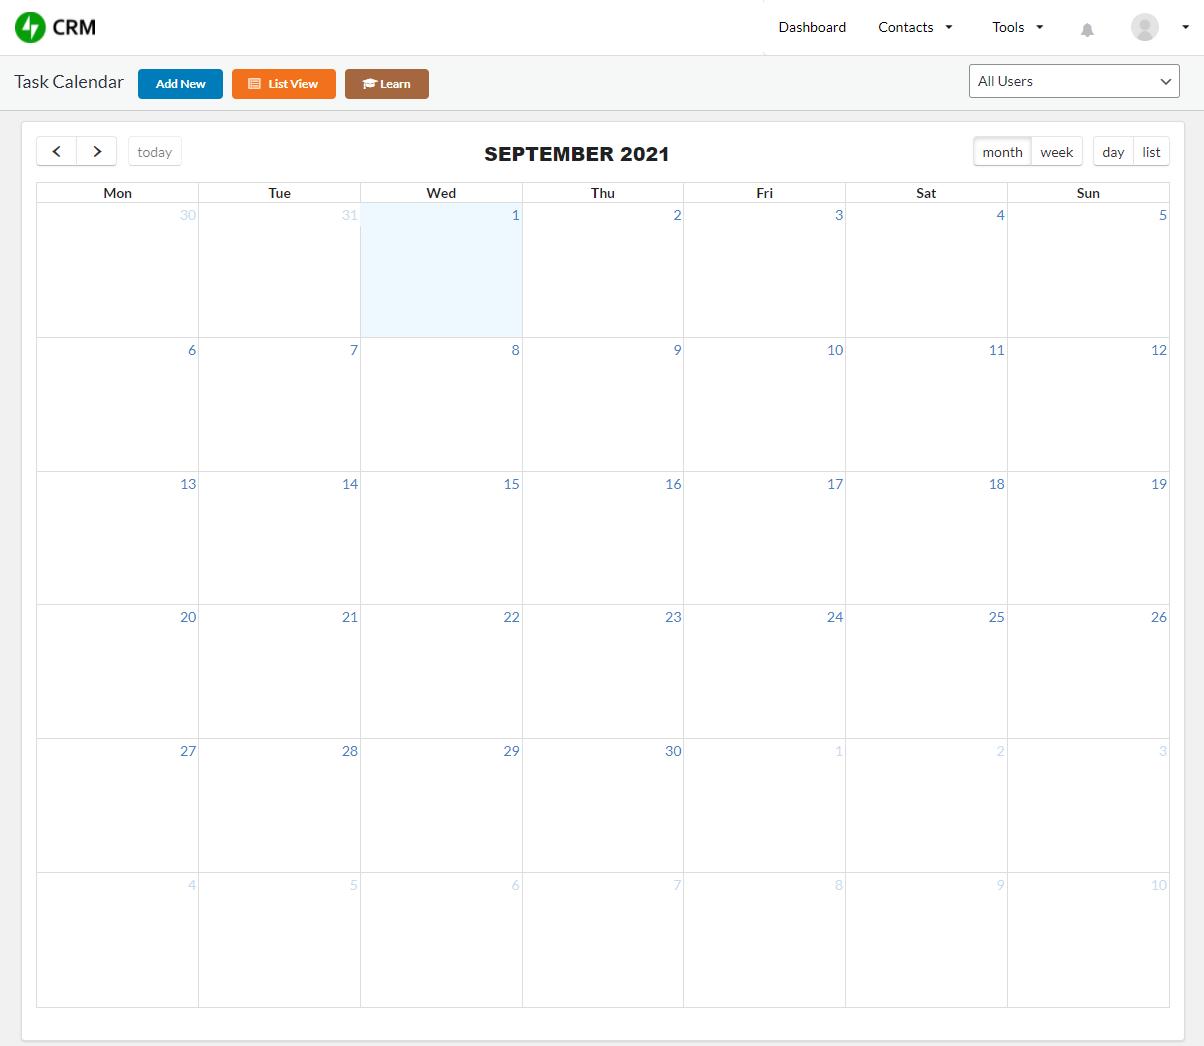 CRM Task Scheduler